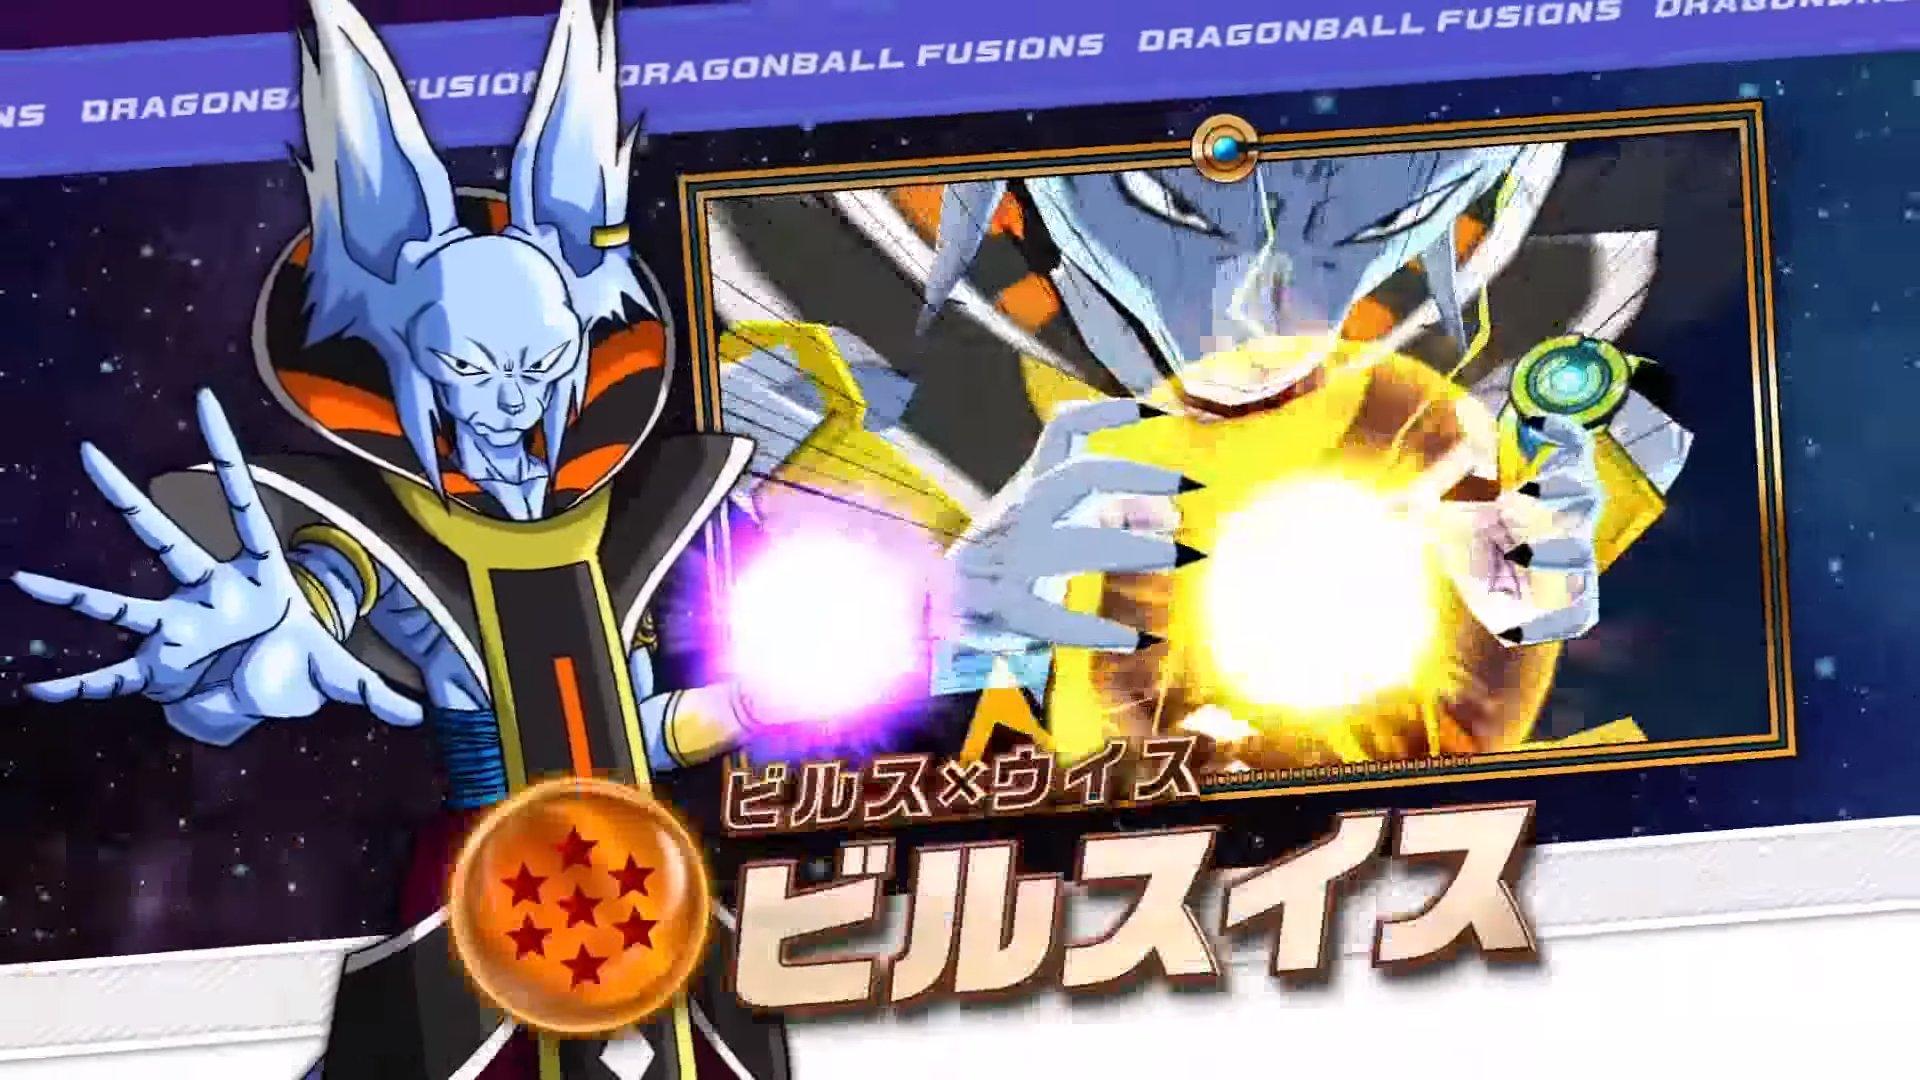 db-fusions_160801